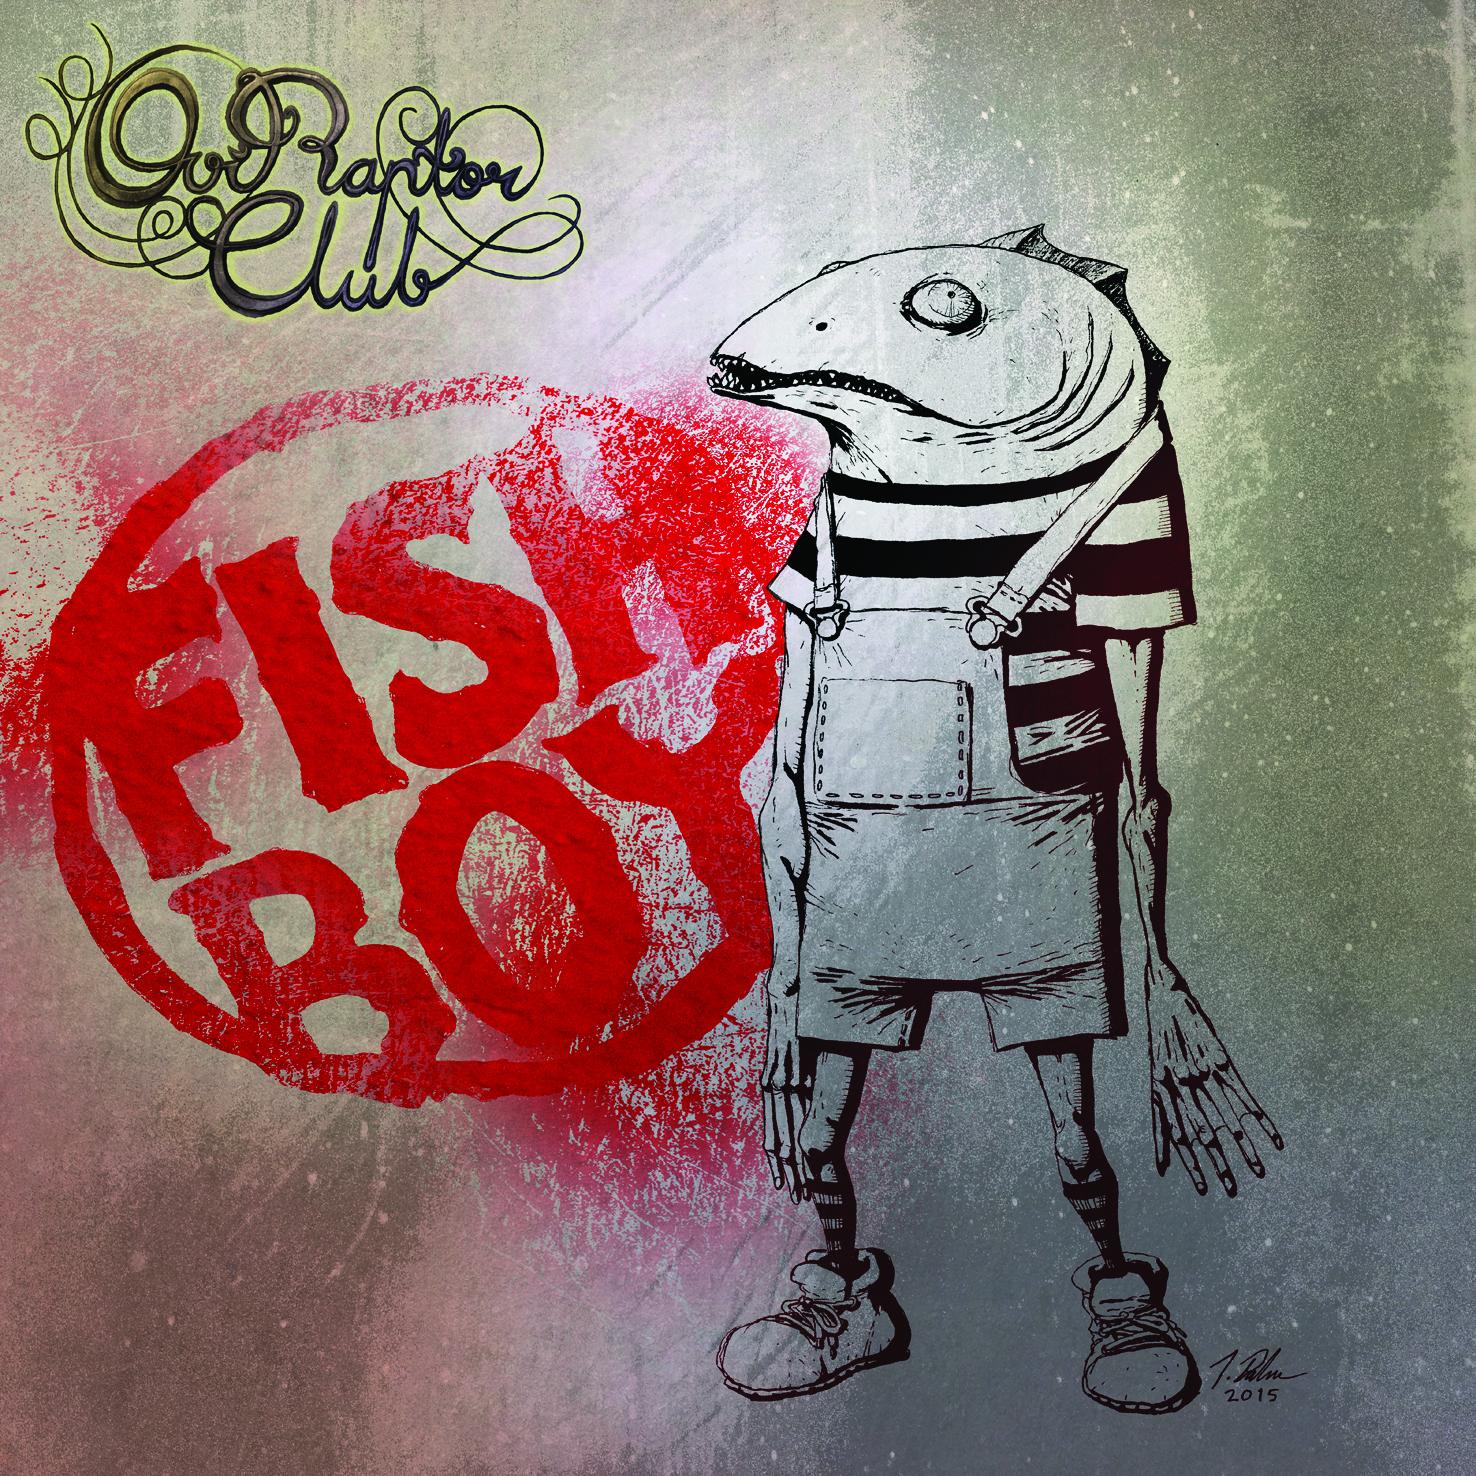 Fishboy album cover.jpg